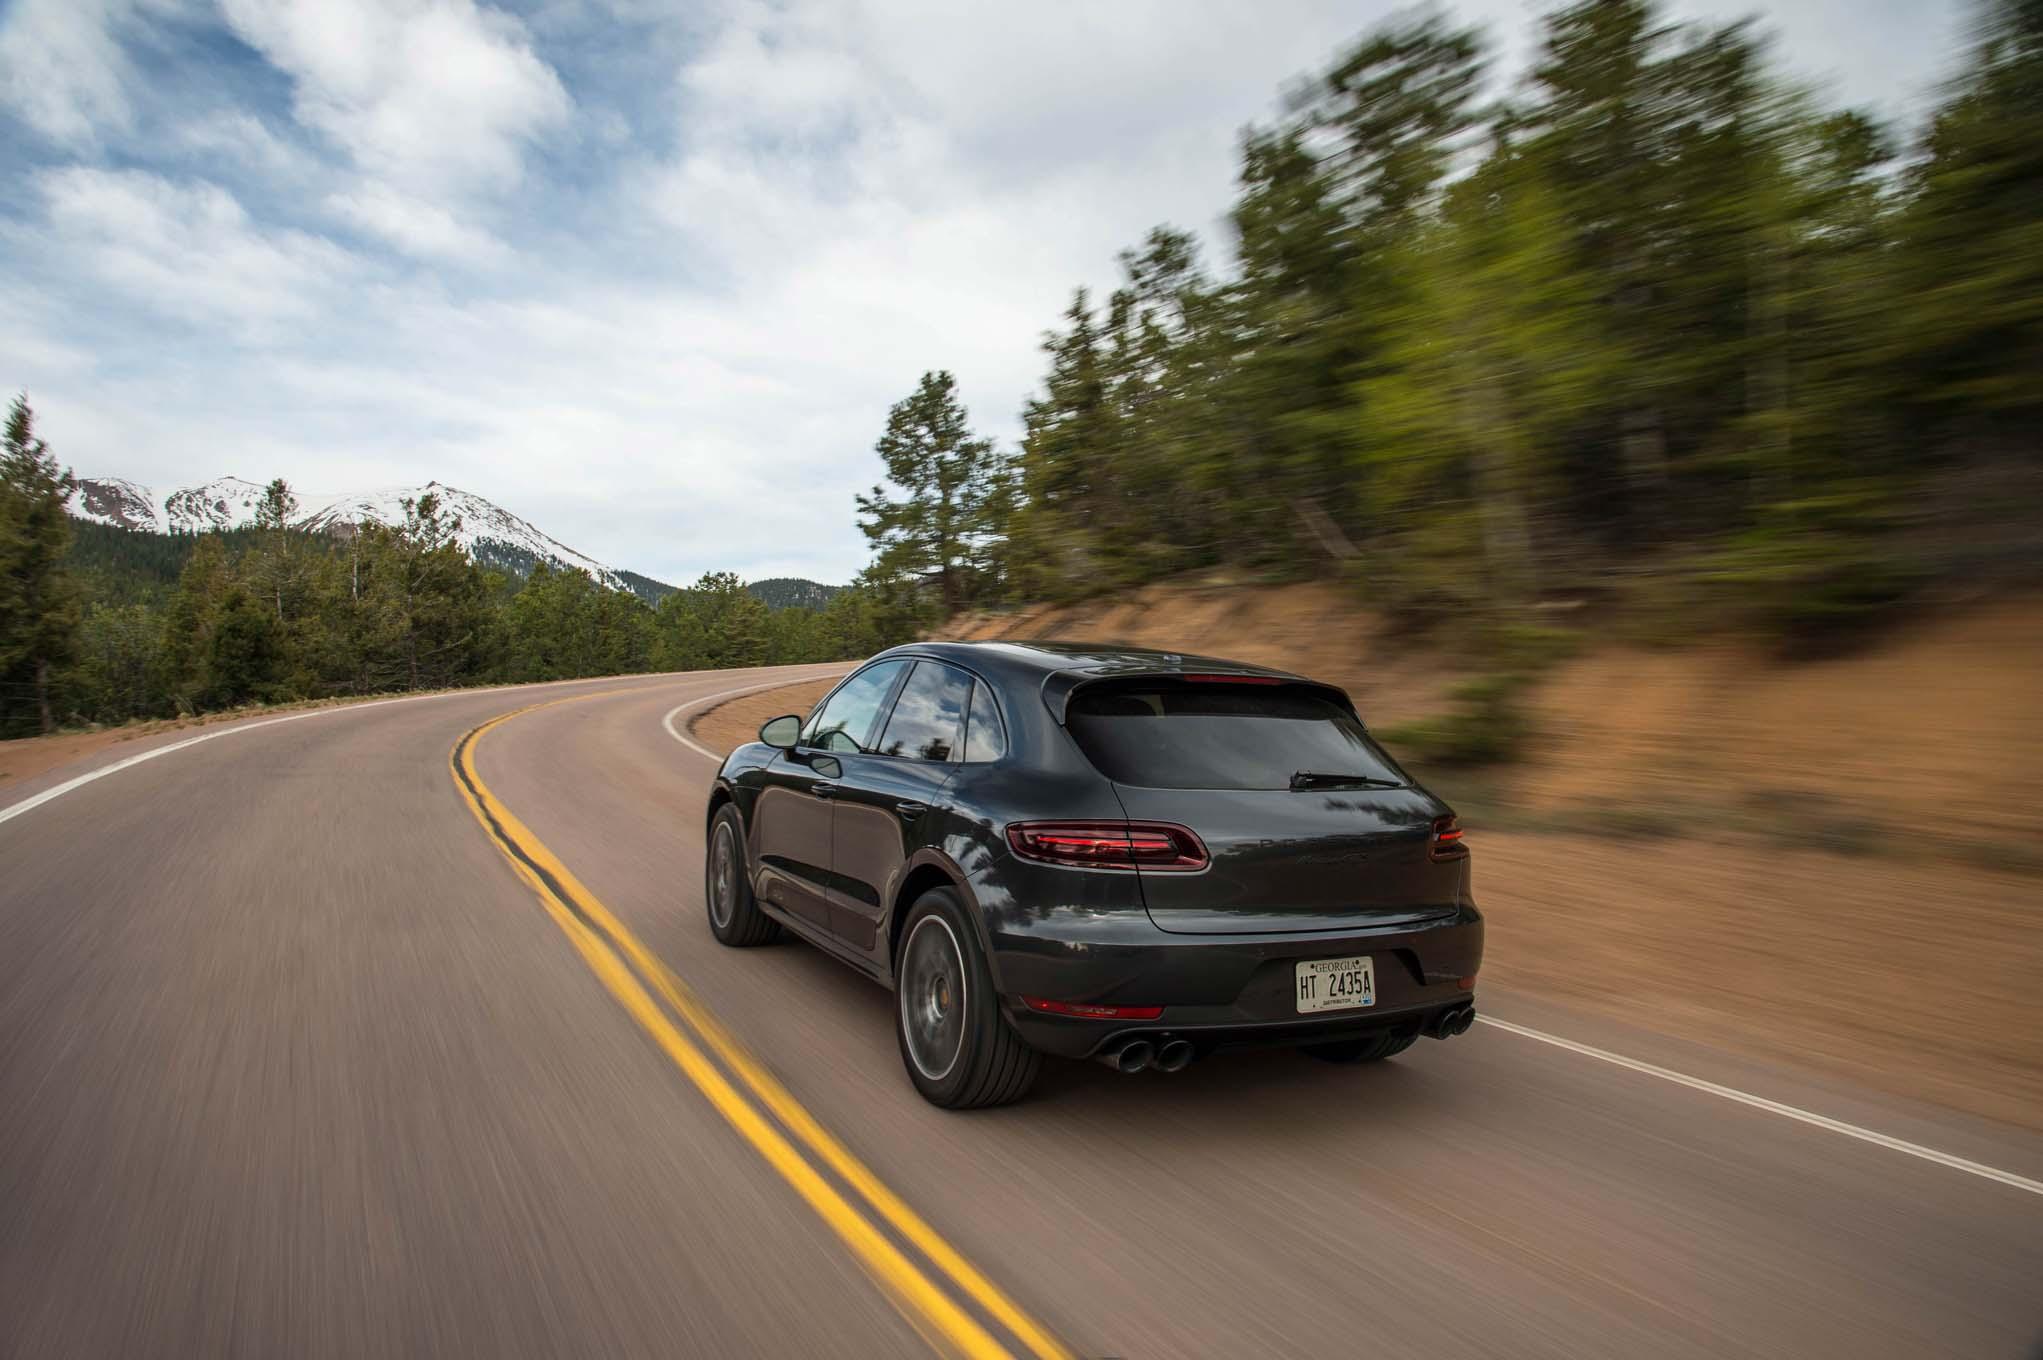 2017 Porsche Macan Gts One Week Review Automobile Magazine